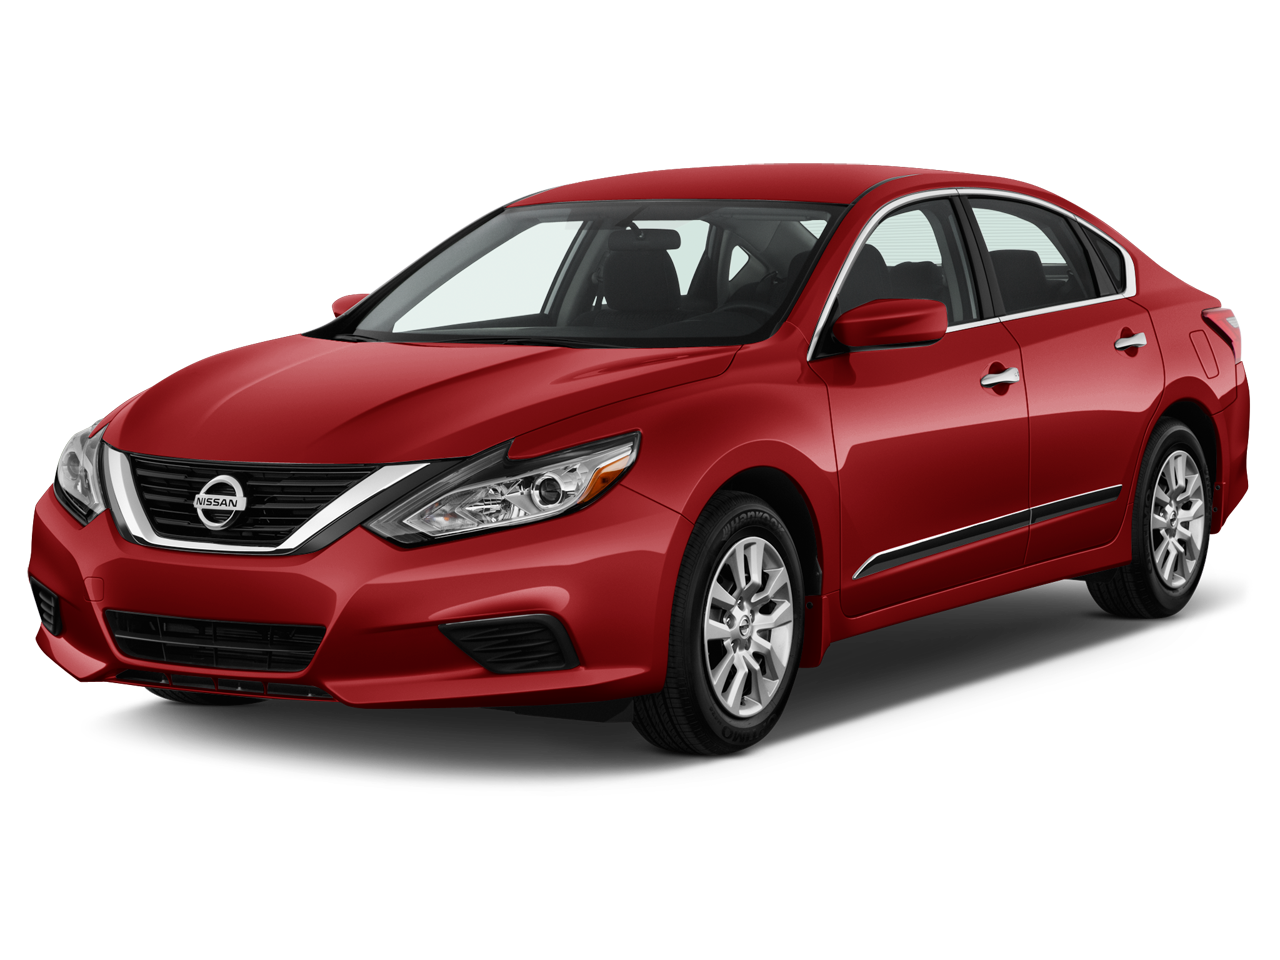 New 2018 Nissan Altima 2.5 S - Toms River NJ Near New York ...